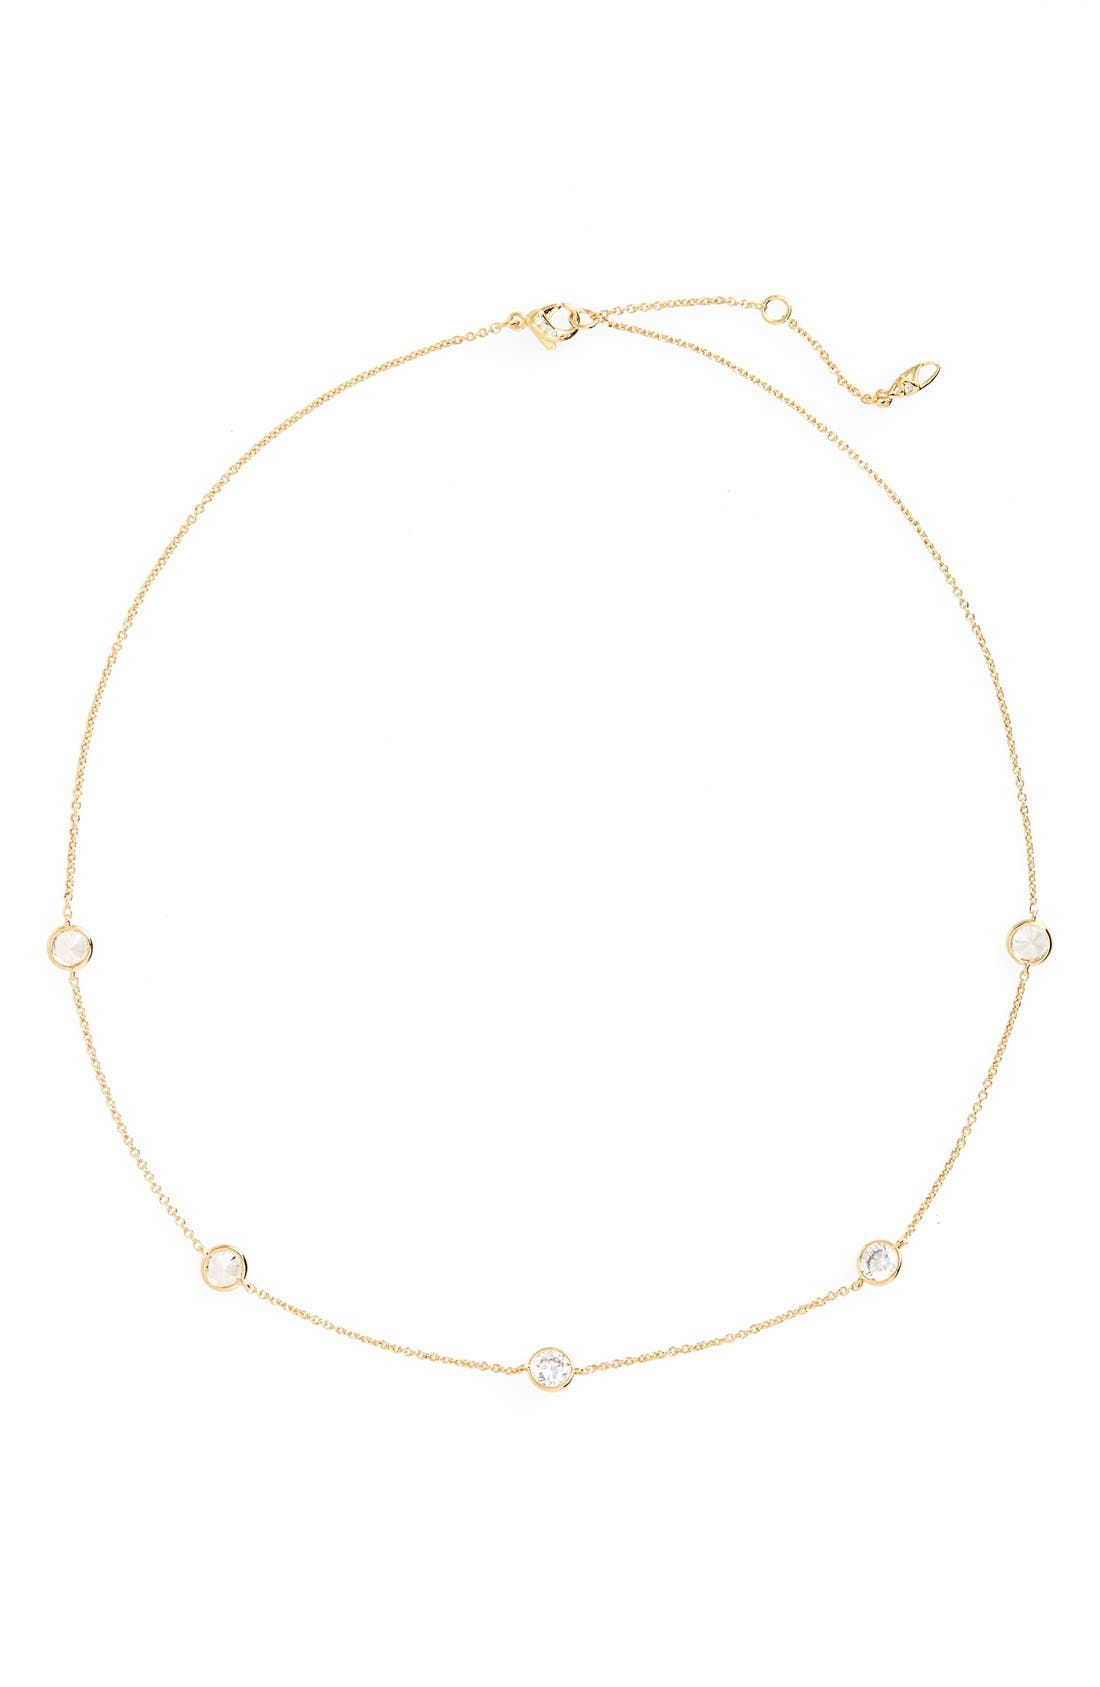 Cubic Zirconia Bezel Station Necklace,                         Main,                         color, Gold